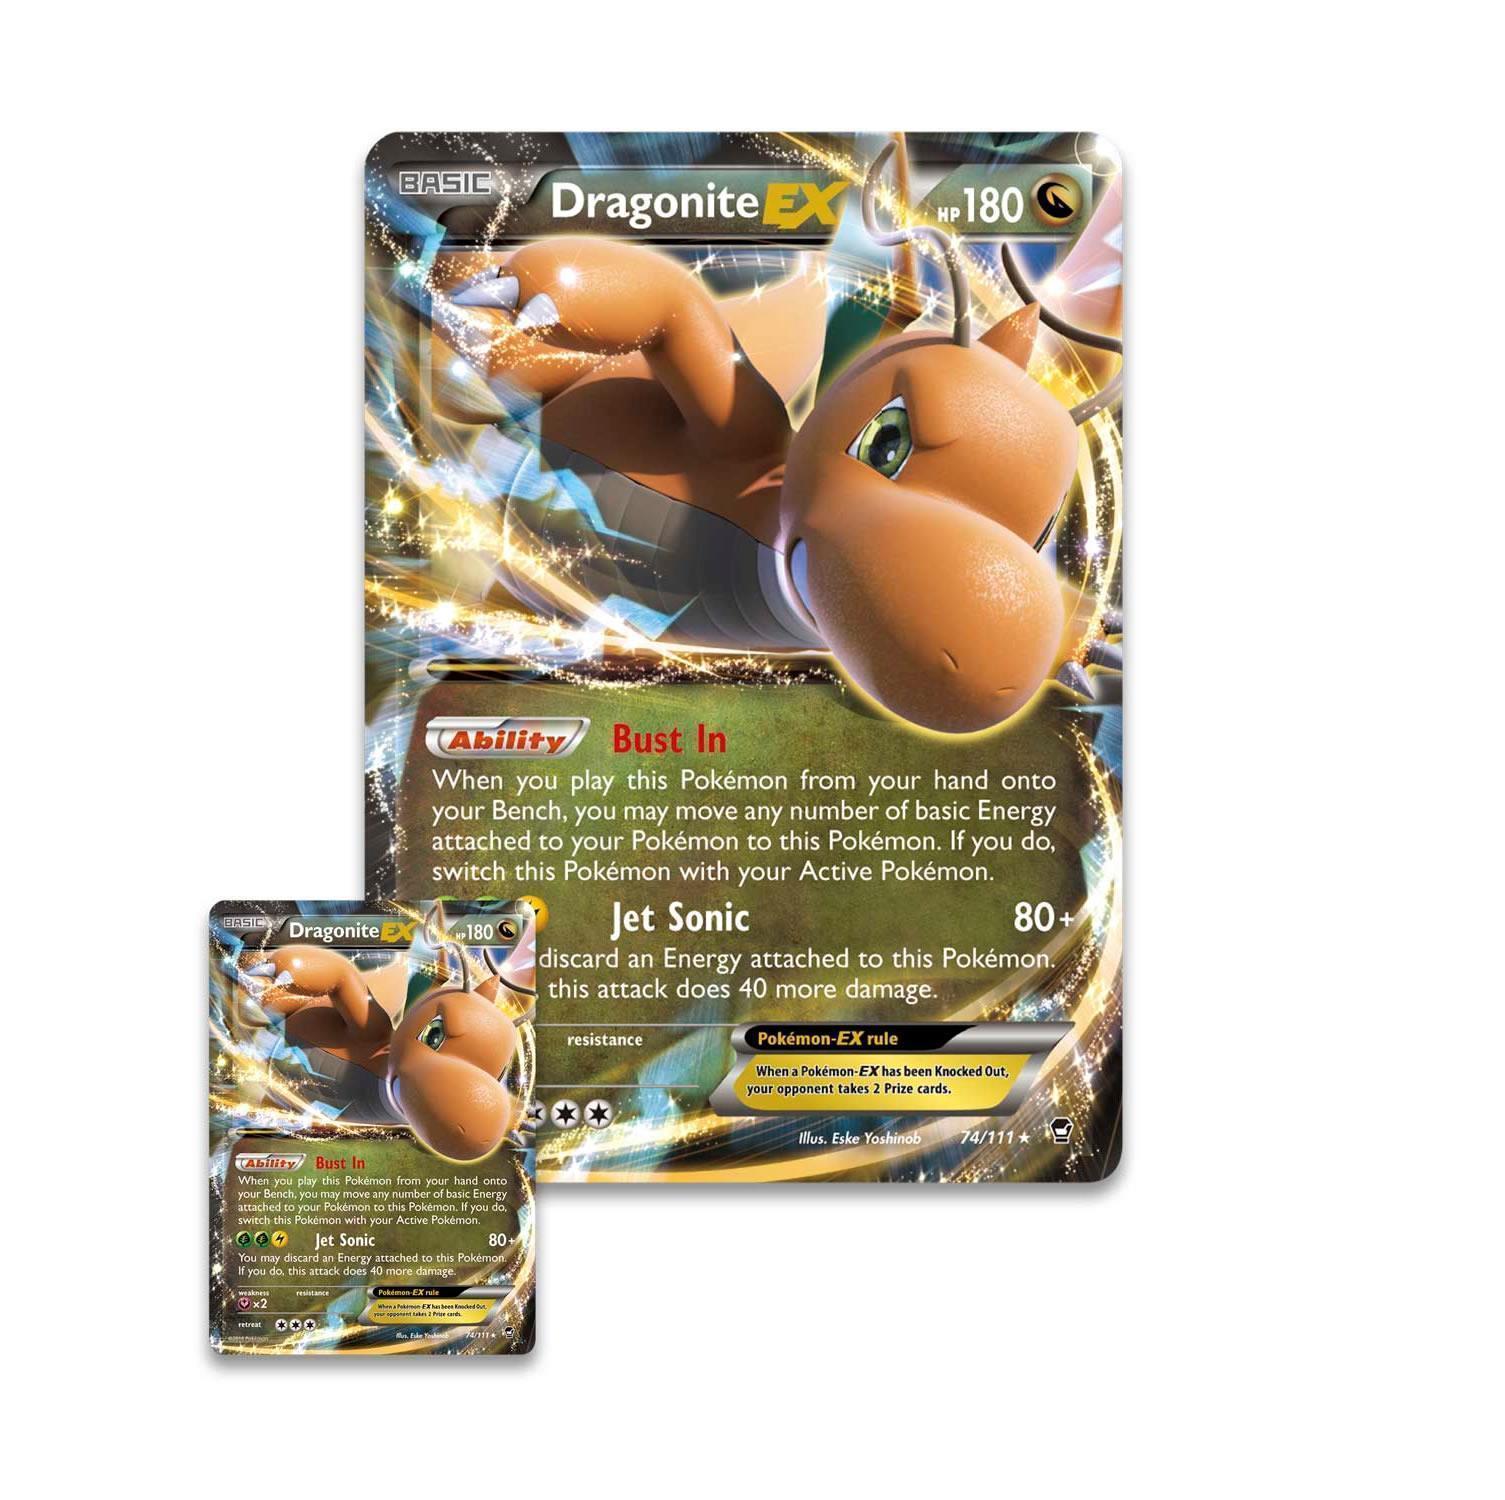 Ash-Greninja EX Box + Dragonite EX Box POKEMON TCG Sealed Booster Packs